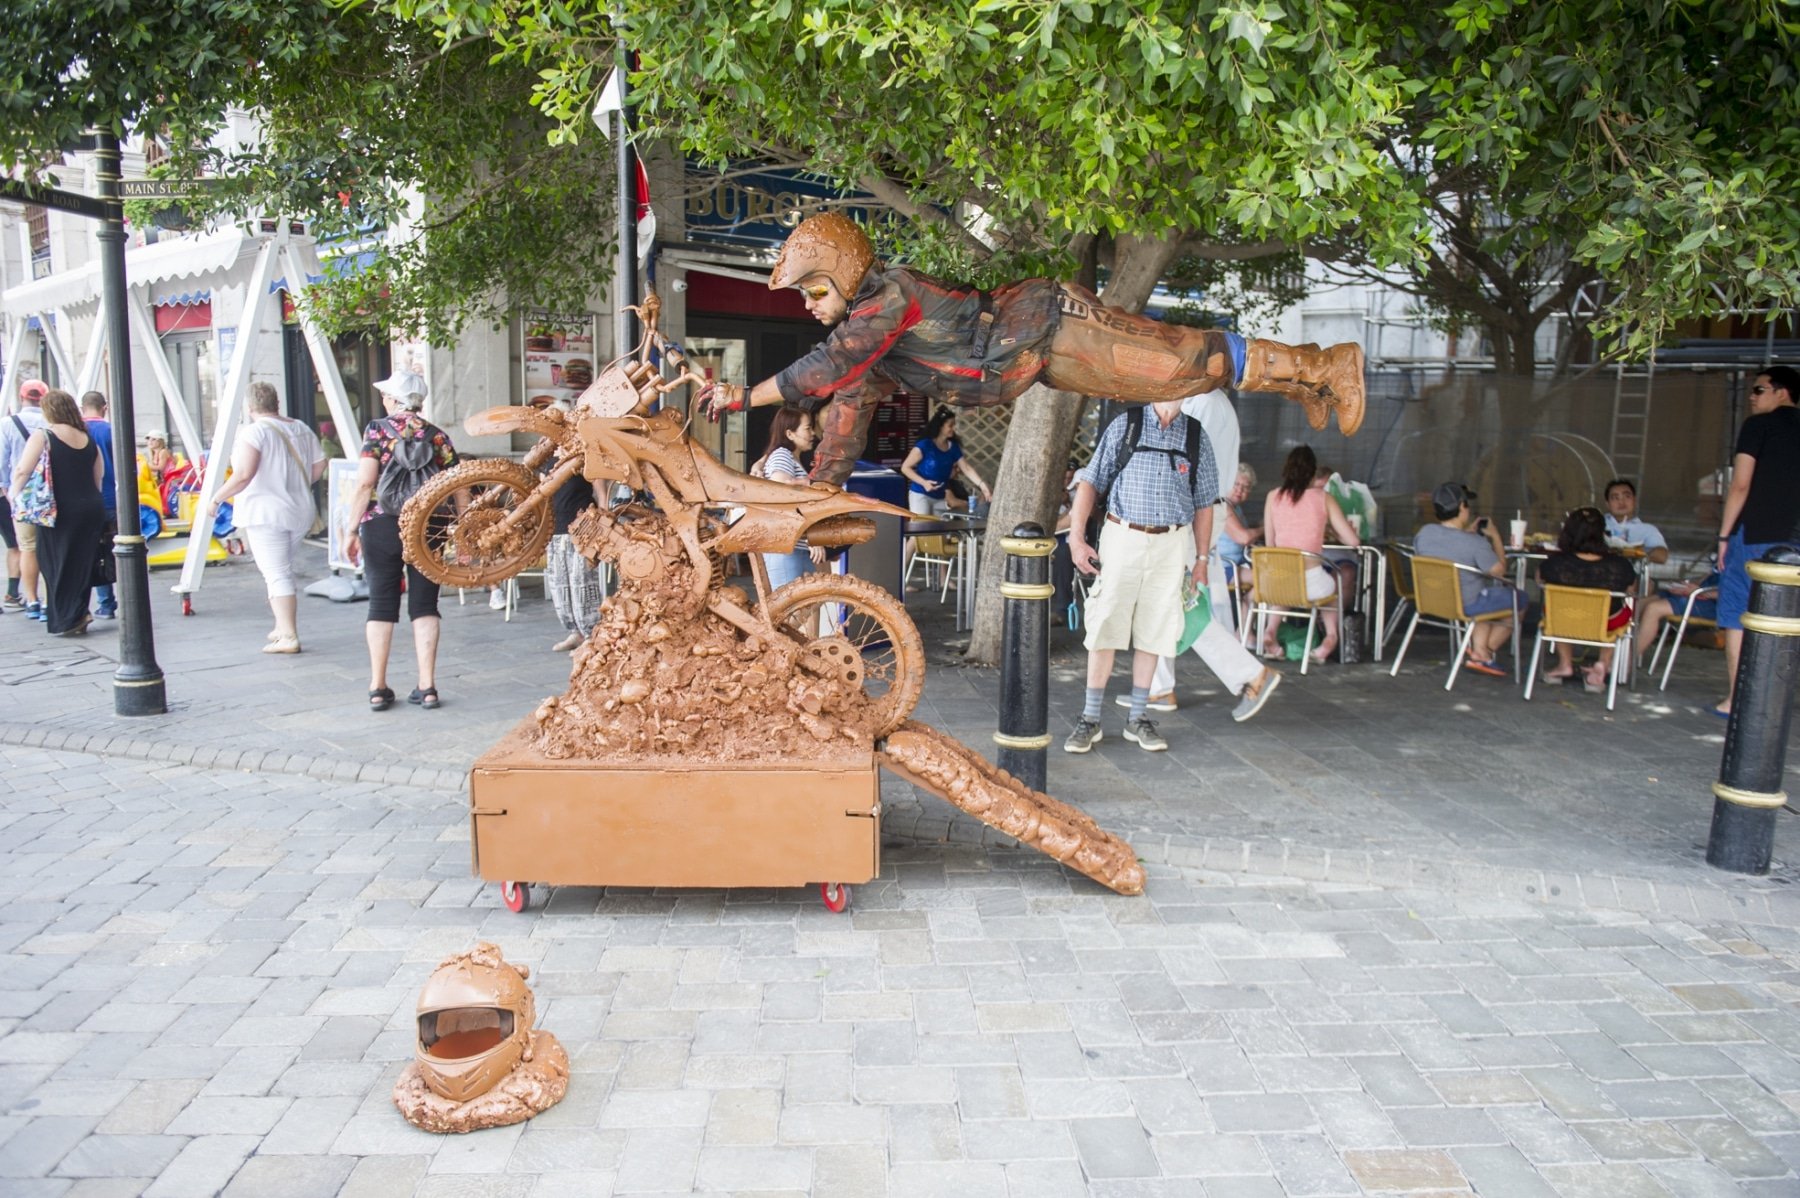 esculturas-humanas-en-la-plaza-de-casemates-en-gibraltar_22117531354_o